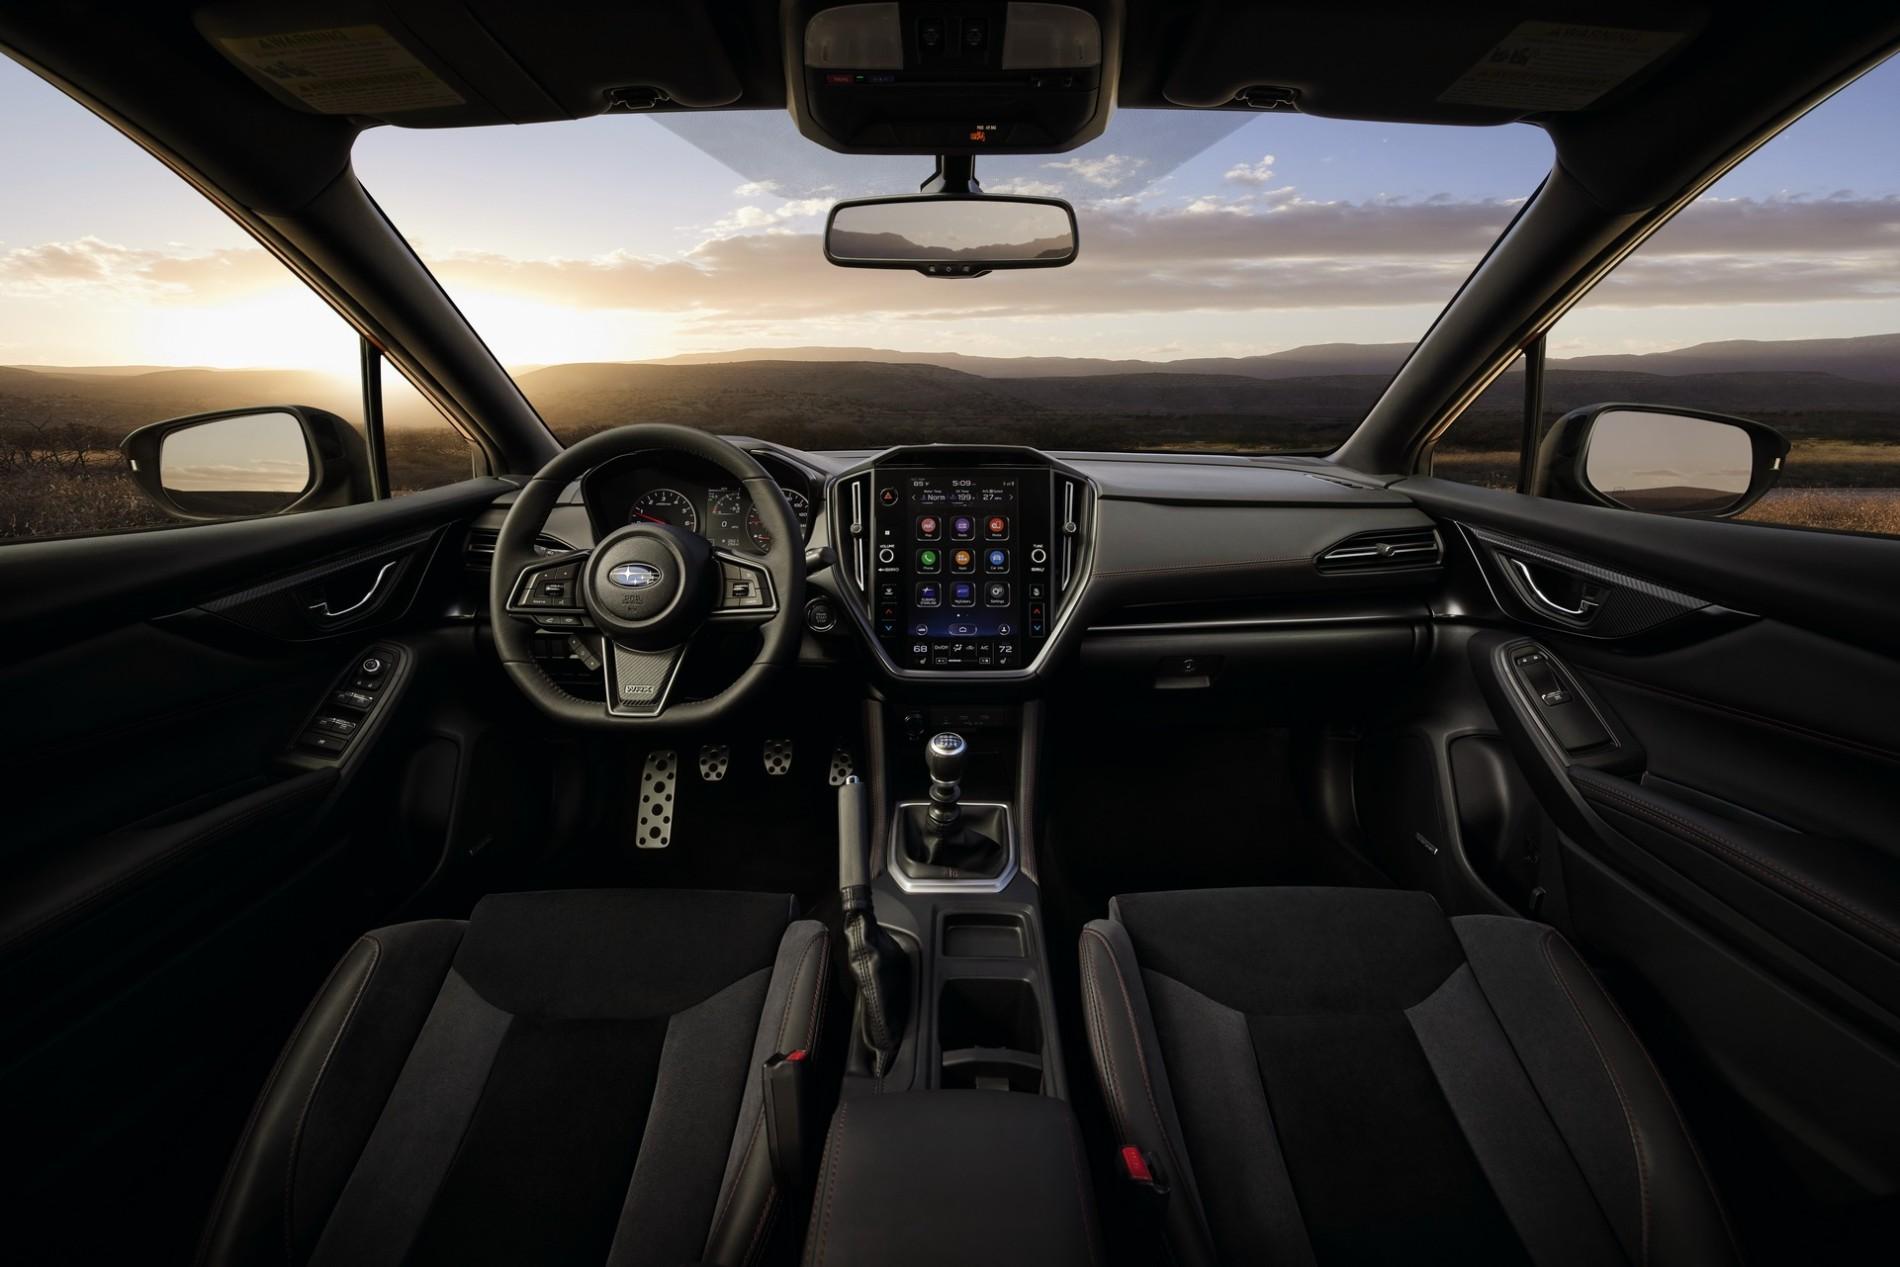 Subaru WRX - Subaru WRX